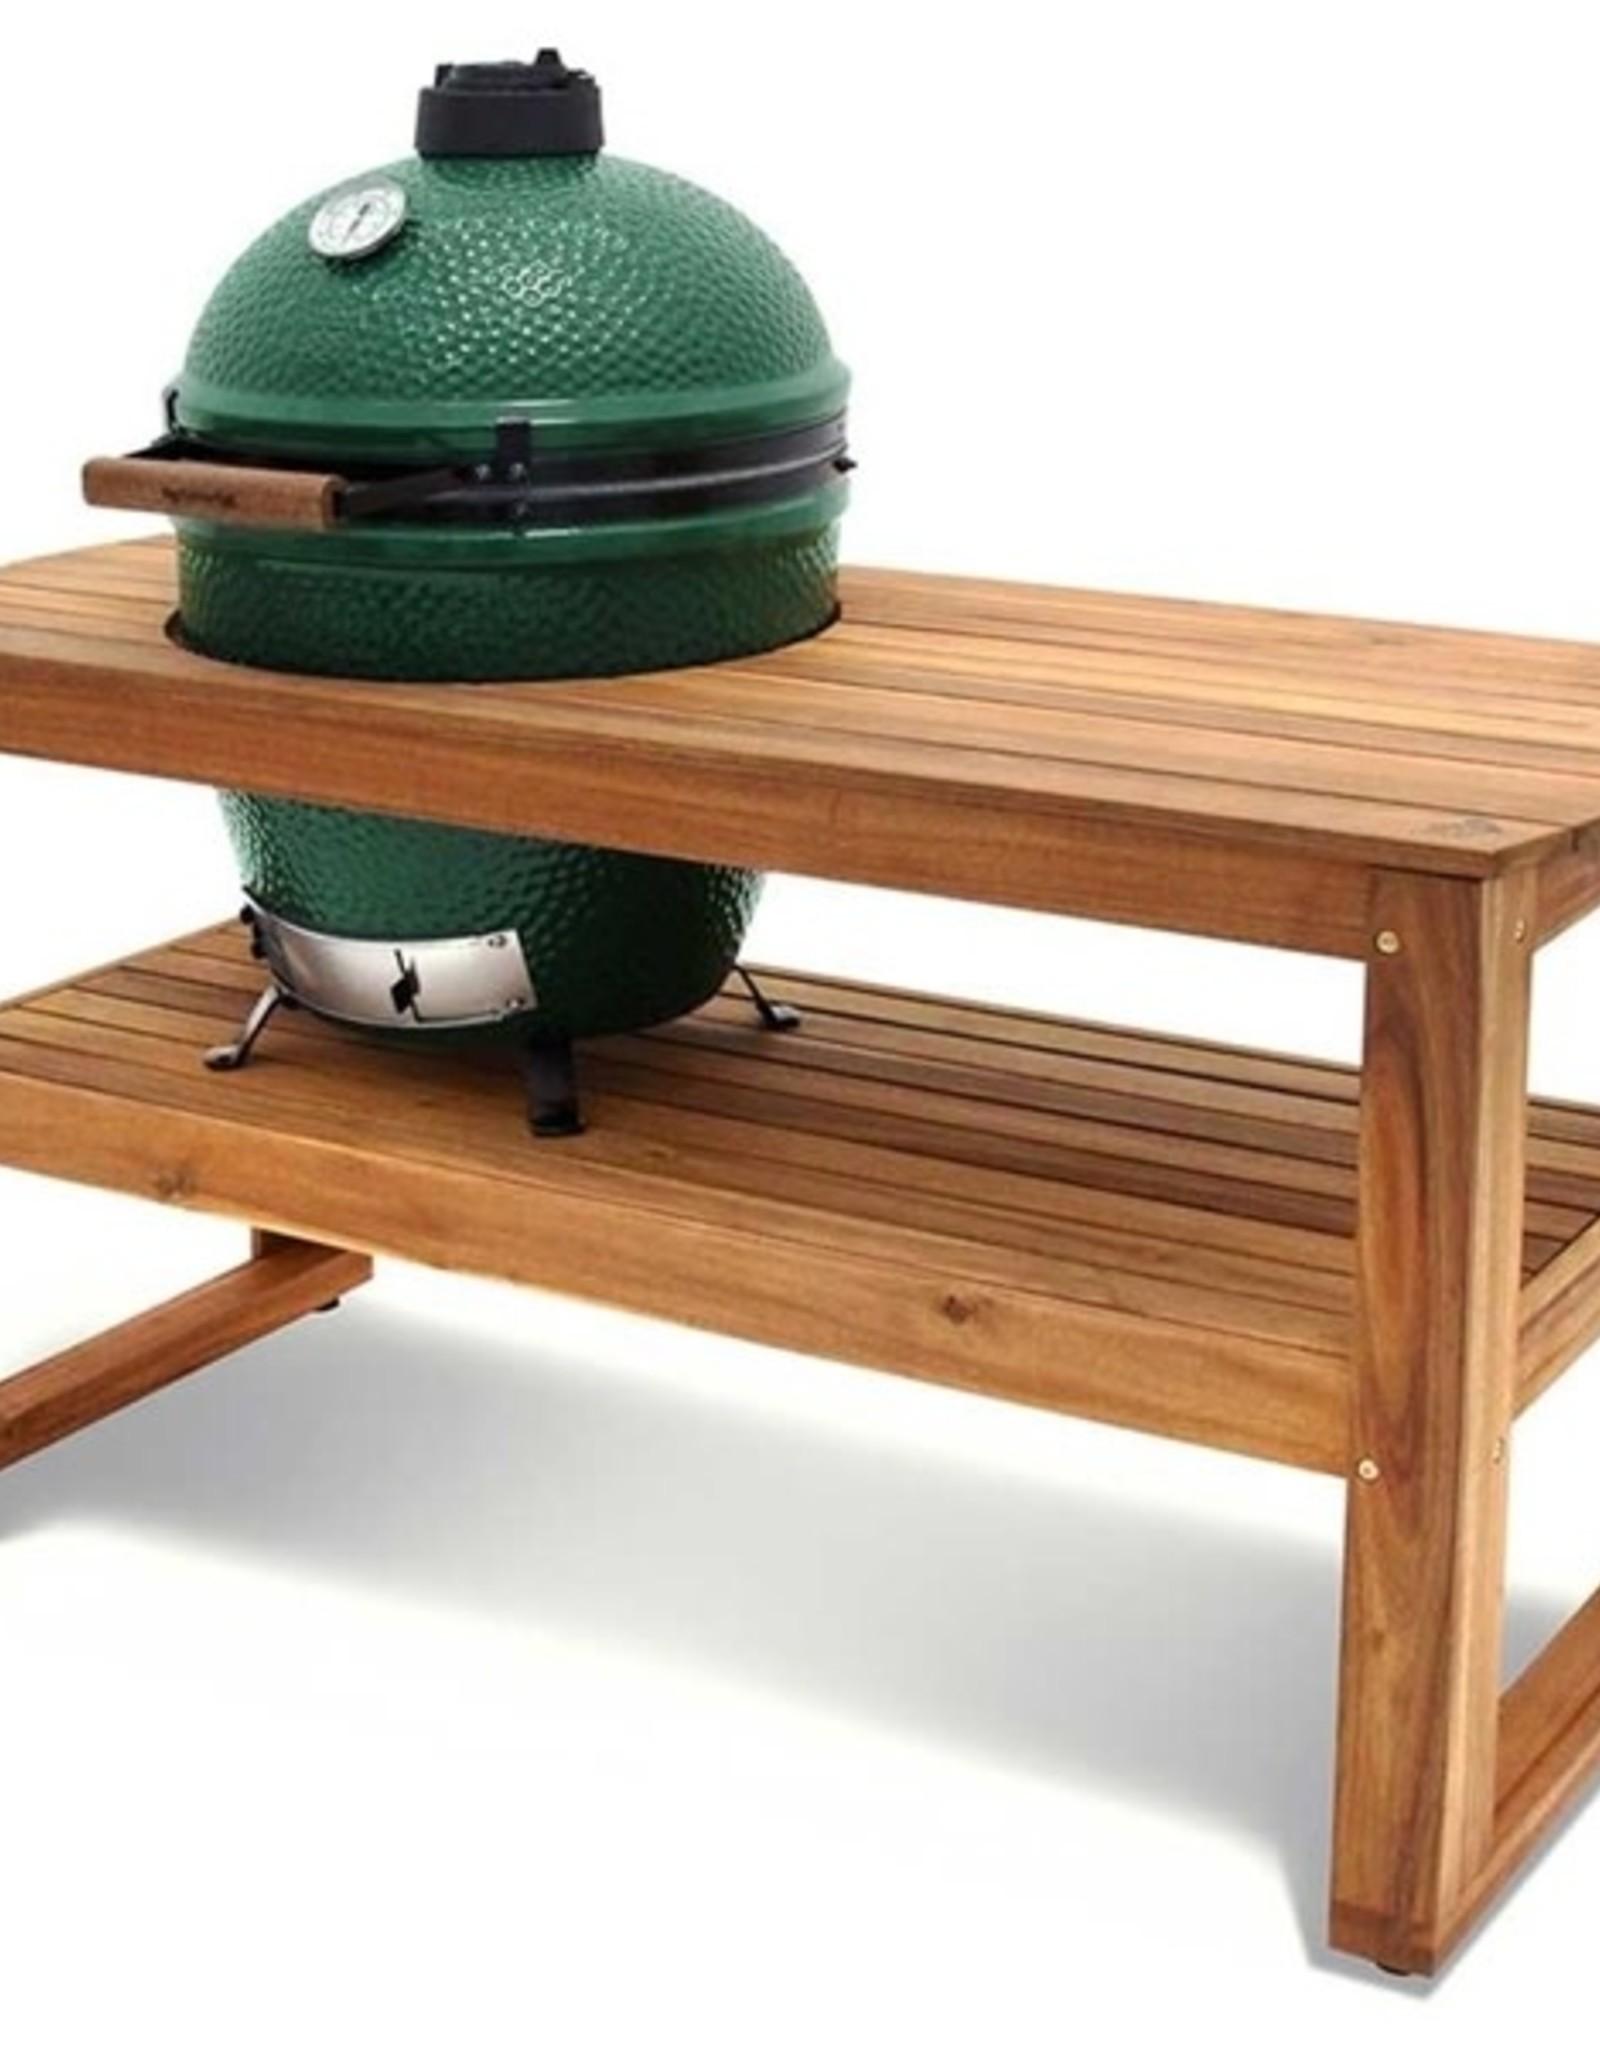 Big Green Egg Big Green Egg - Solid Acacia Hardwood Table for Large EGG 60 L x 25 W x 31 H